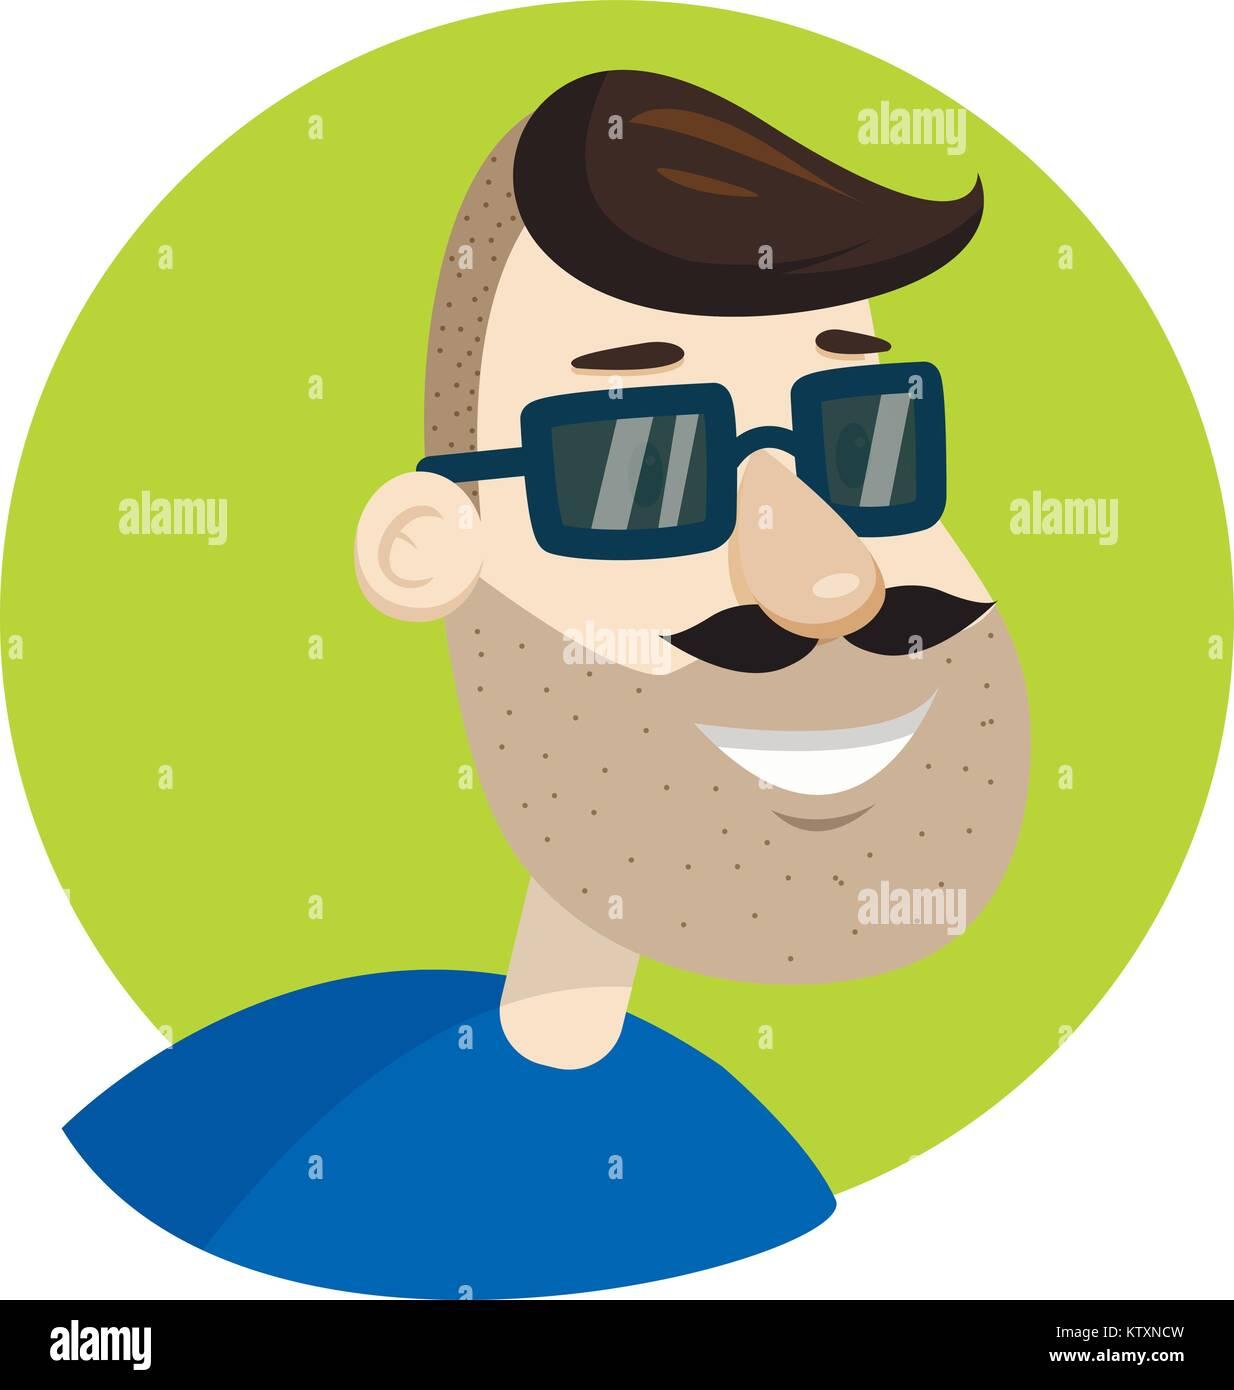 Mustache amp; Alamy Boy Fotos Cartoon Immagini Stock Rv1FwxHq